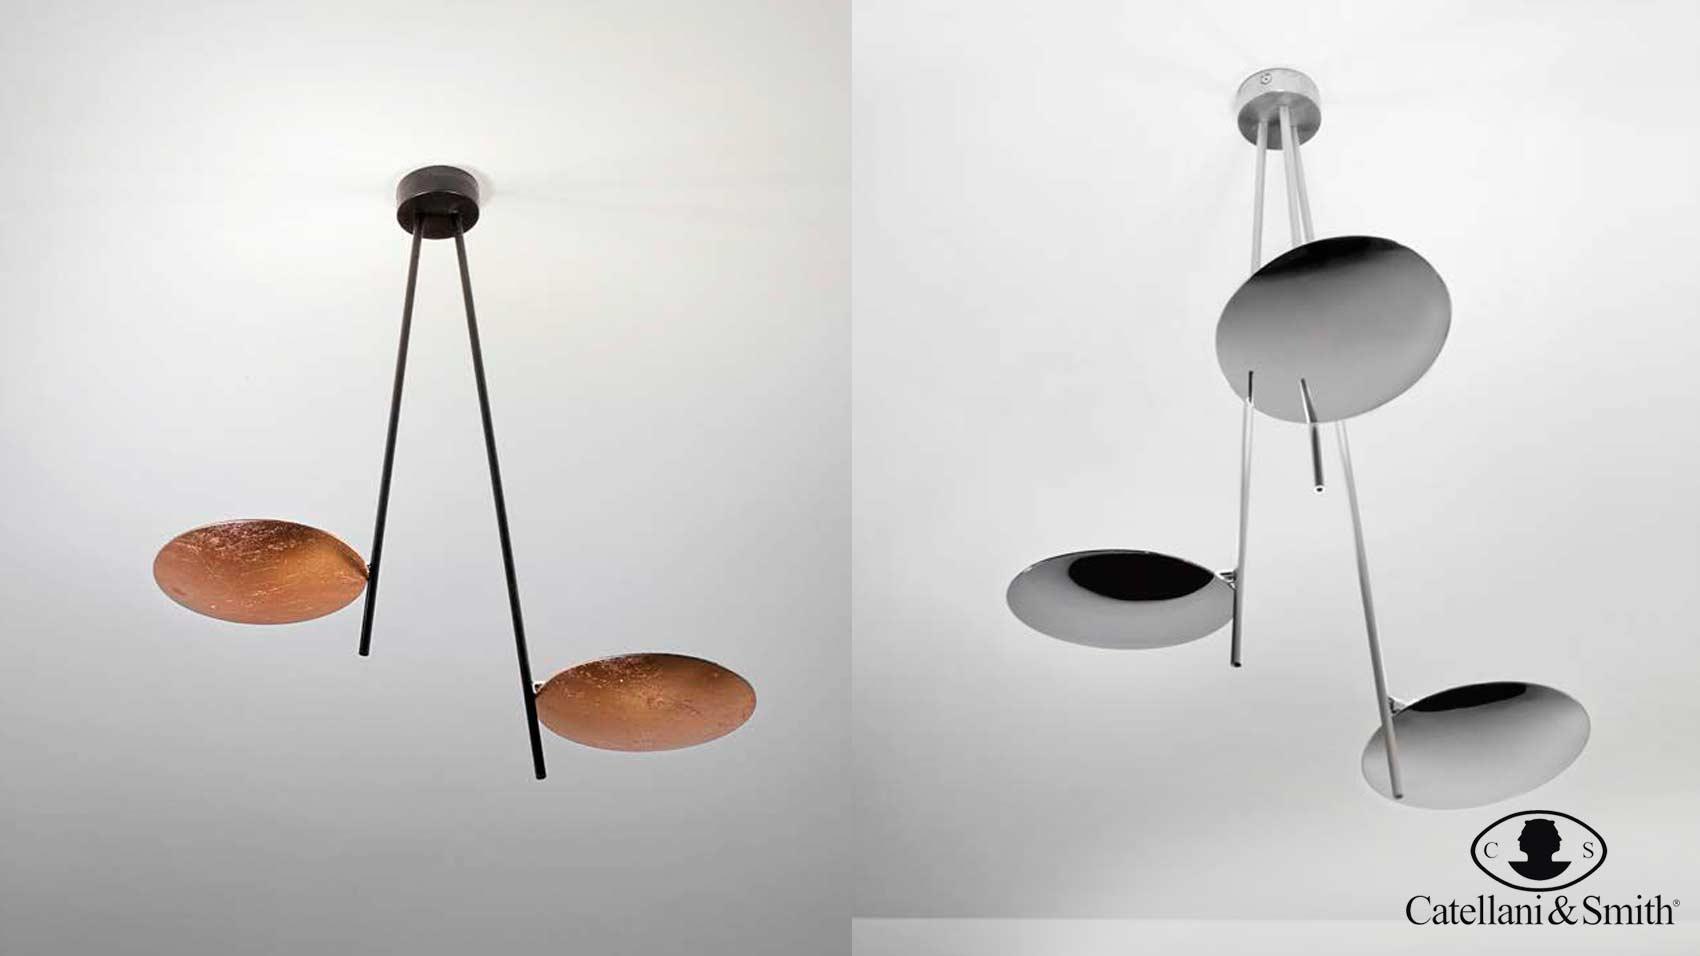 wohnaccessoires wohndeko in blankenhain m bel u k chen. Black Bedroom Furniture Sets. Home Design Ideas